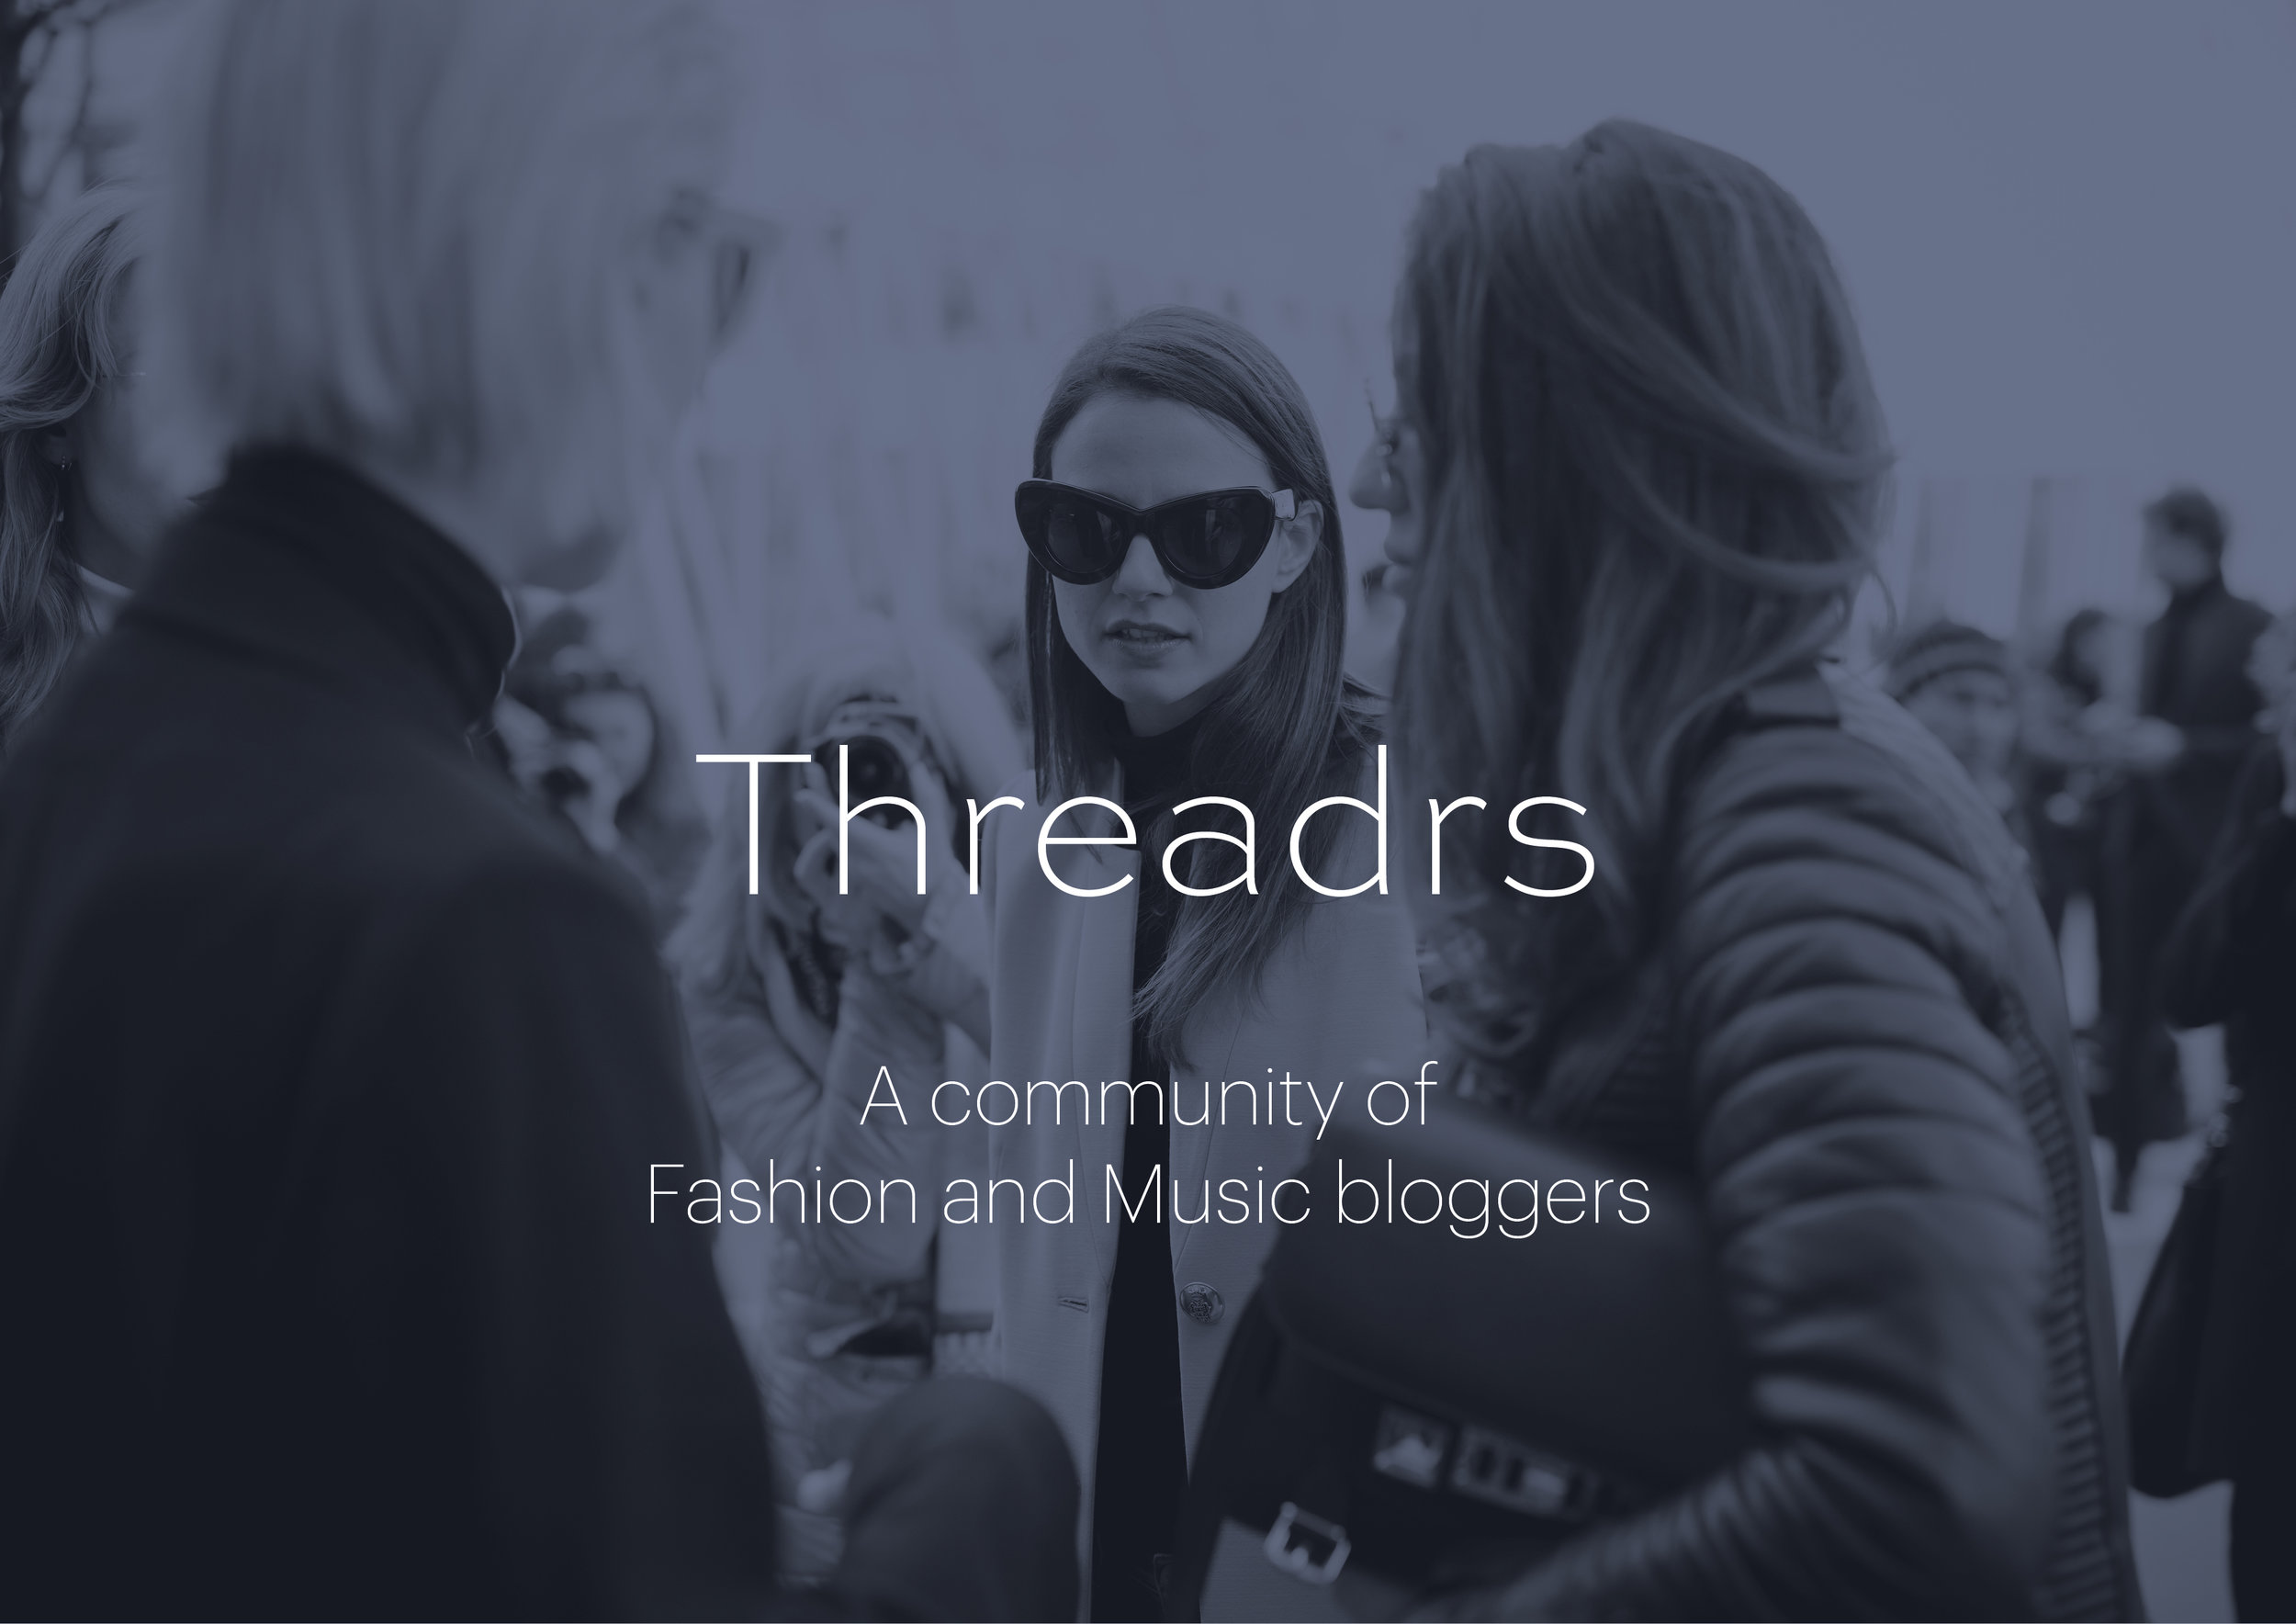 Threadrs-Bloggers-V1.jpg